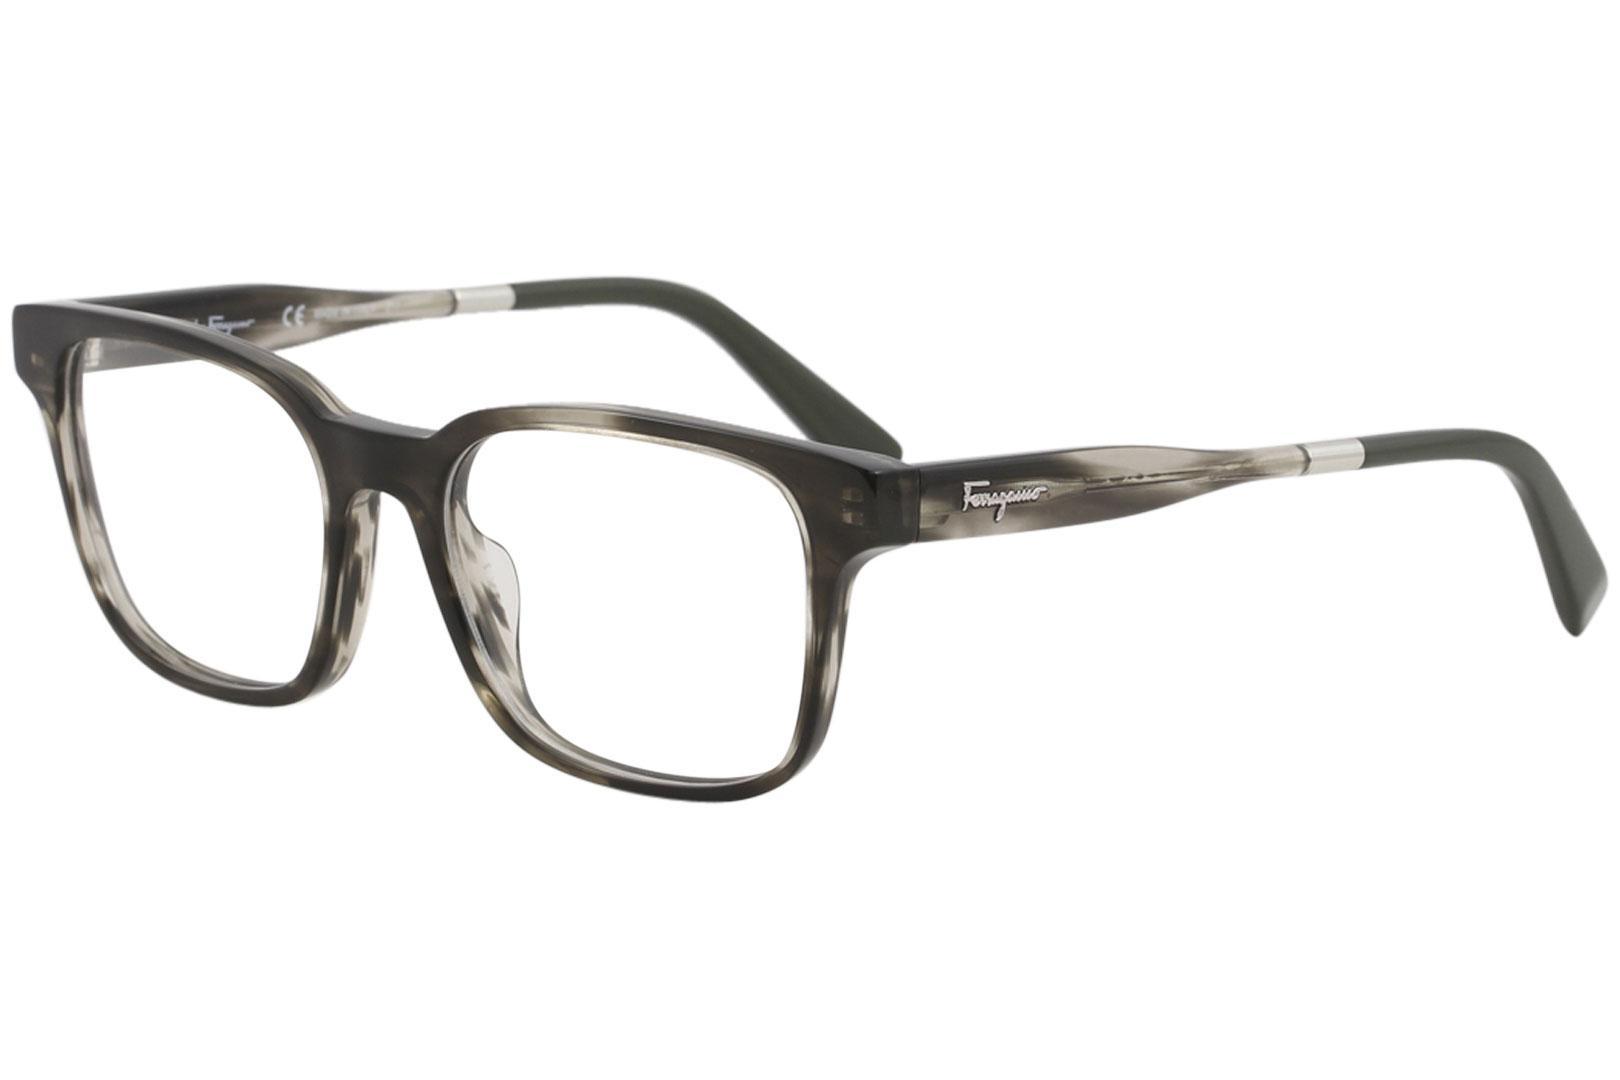 cac5fa20dc9 Salvatore Ferragamo Men s Eyeglasses SF2787 SF 2787 Full Rim Optical Frame